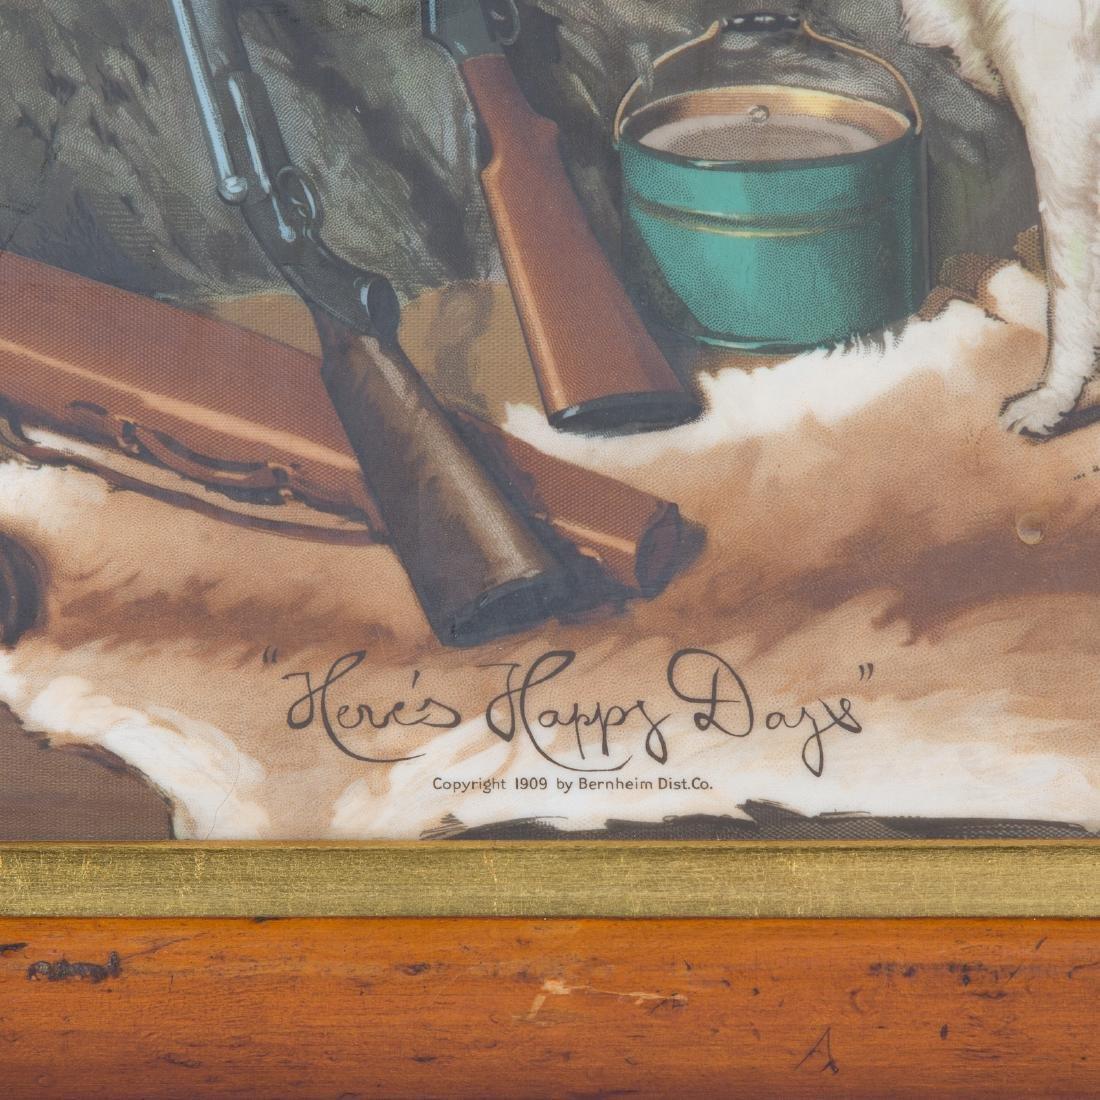 I.W. Harper Whiskey Vitrolite advertising sign - 3